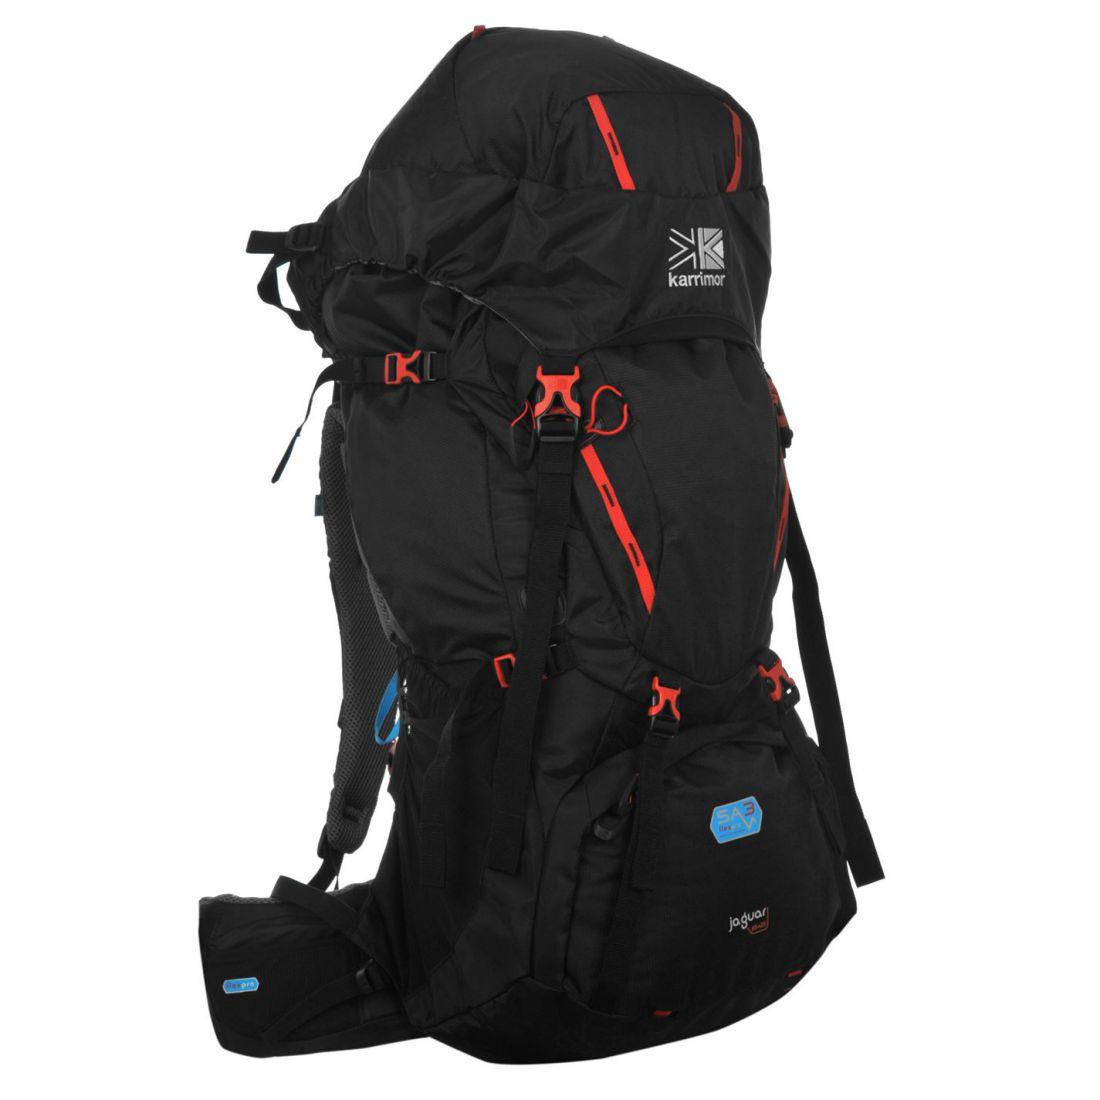 Image is loading Karrimor-Jaguar-65-Rucksack-Outdoor-Hiking-Trekking-Bag- 9583ecc74ab7e